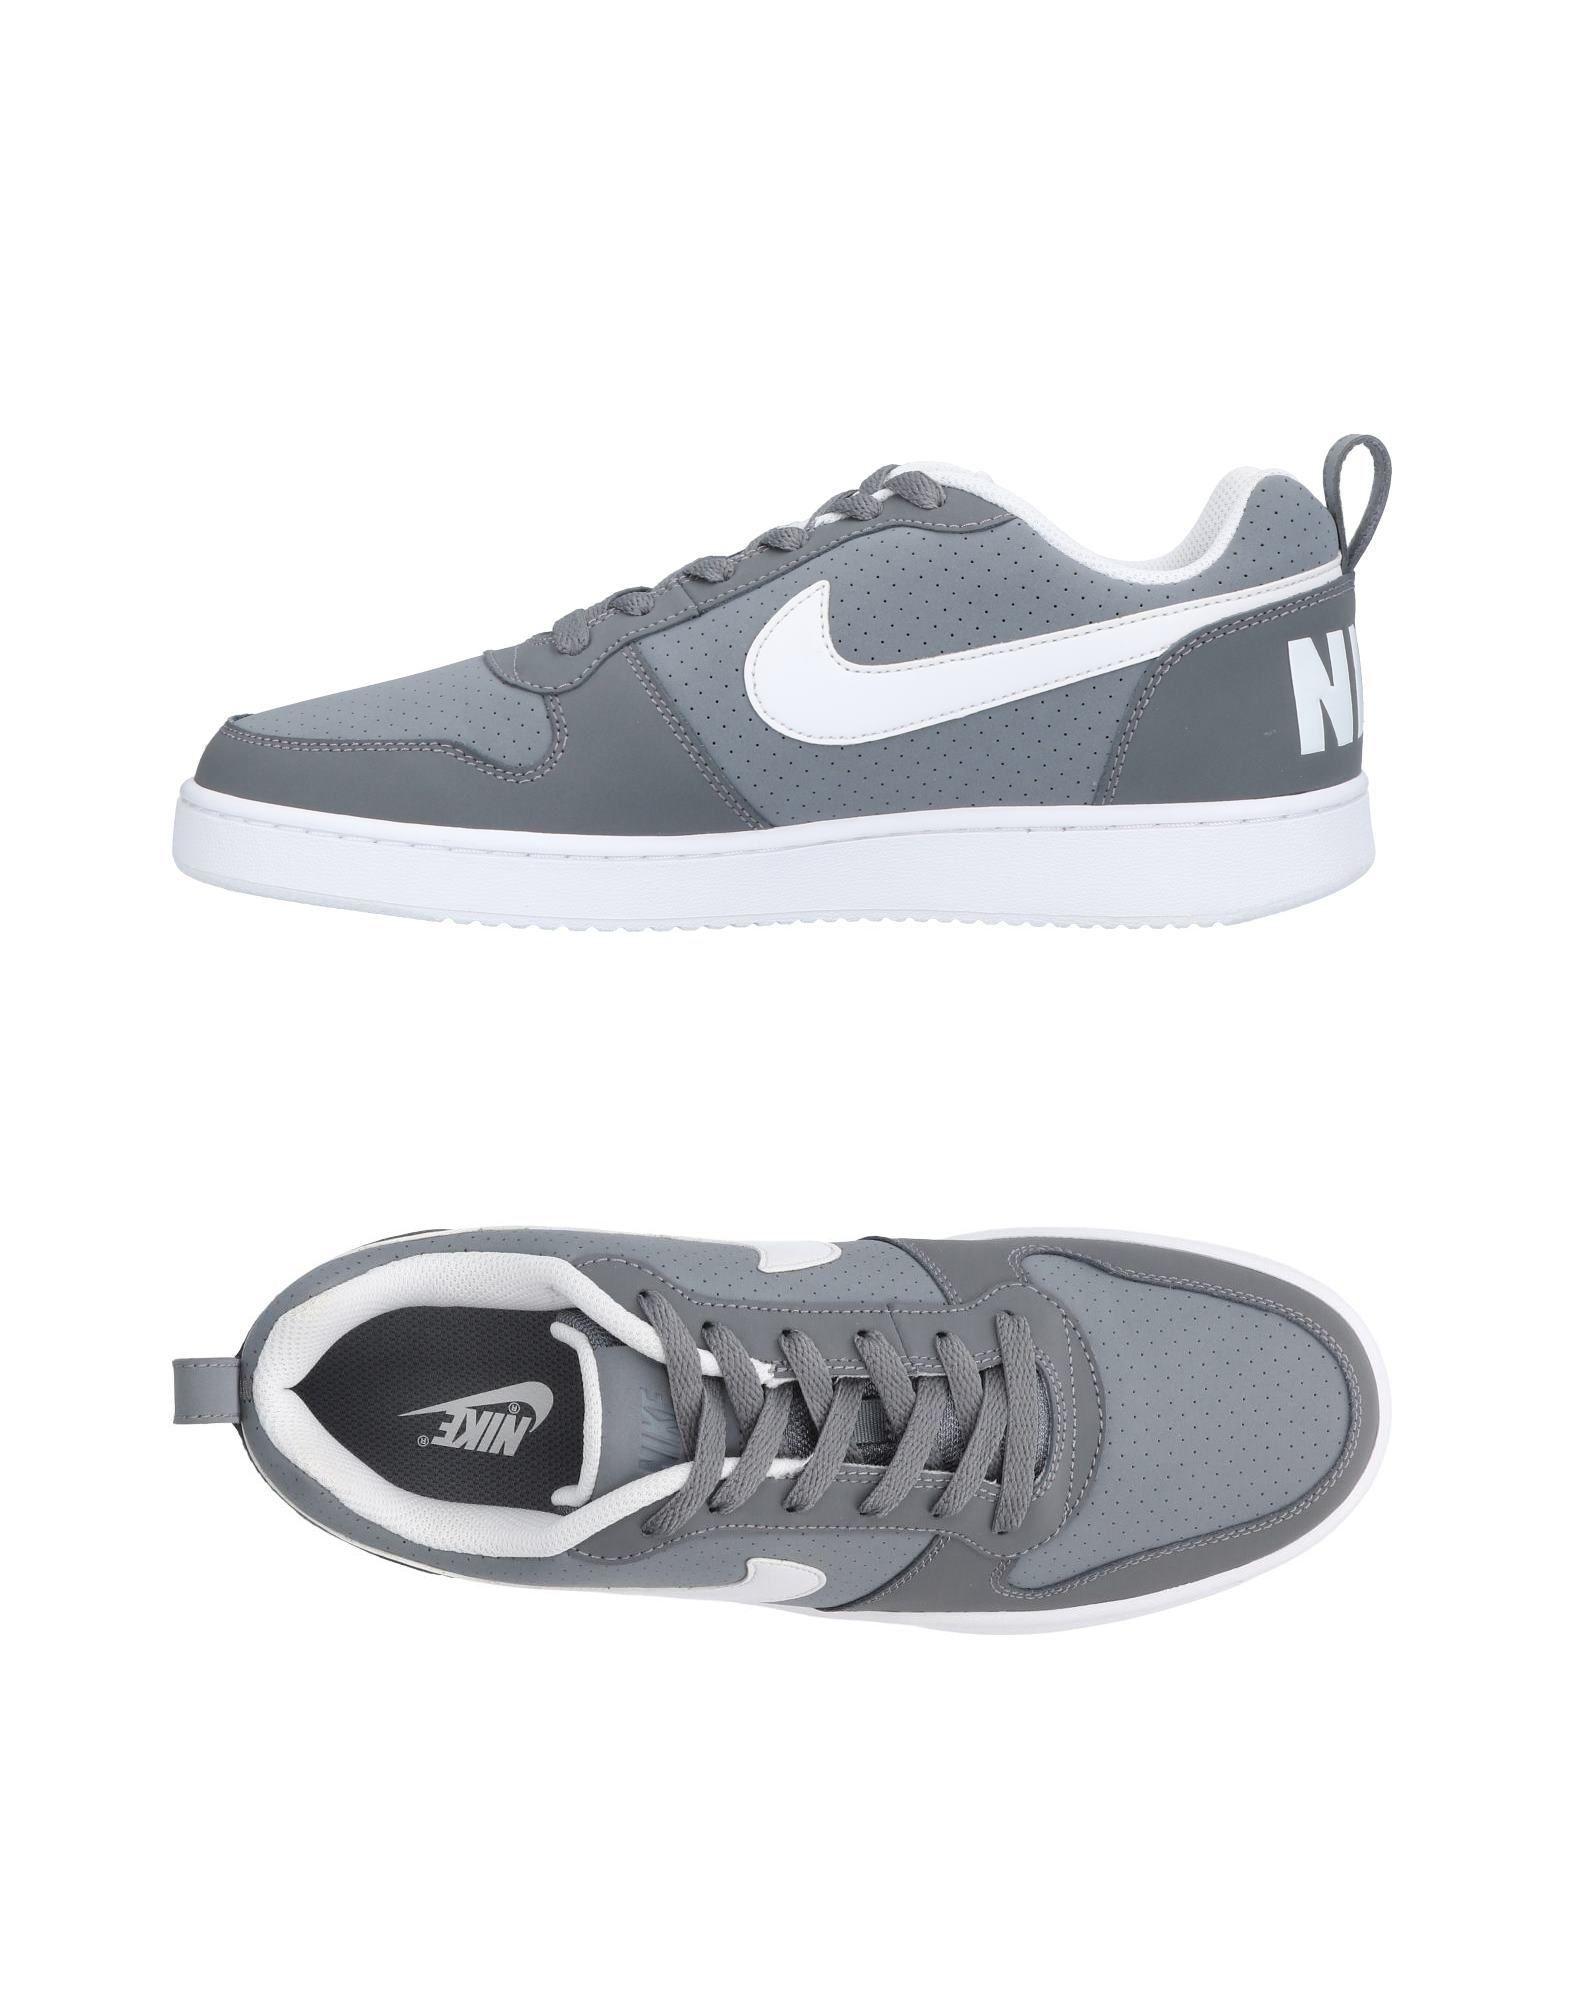 Sneakers Nike Donna - Acquista online su